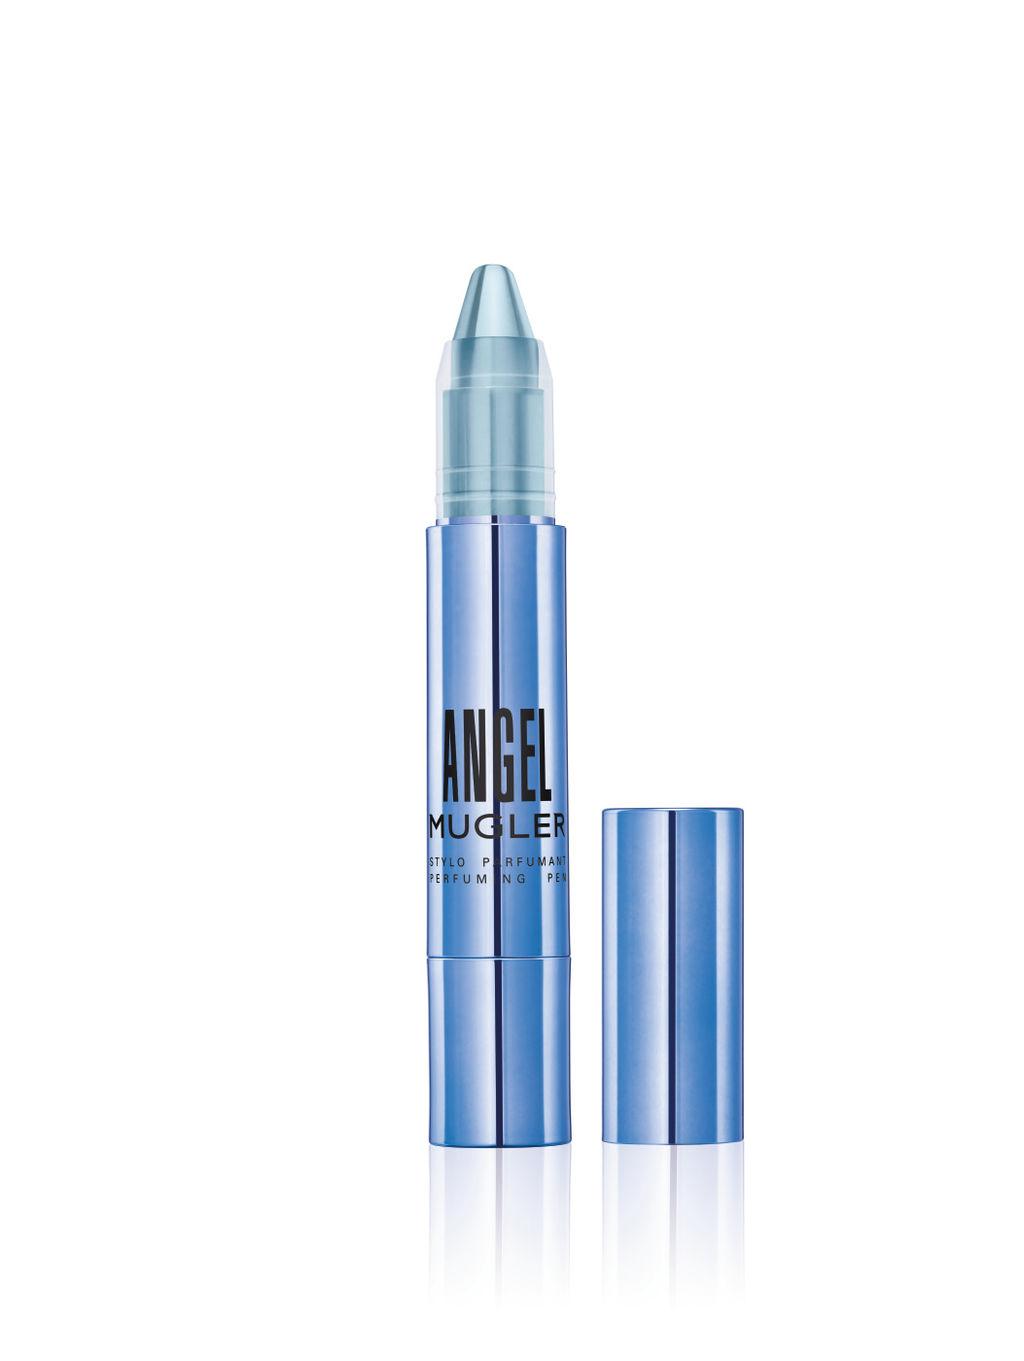 stylo-parfumant-angel-thierry-mugler-29_width1024